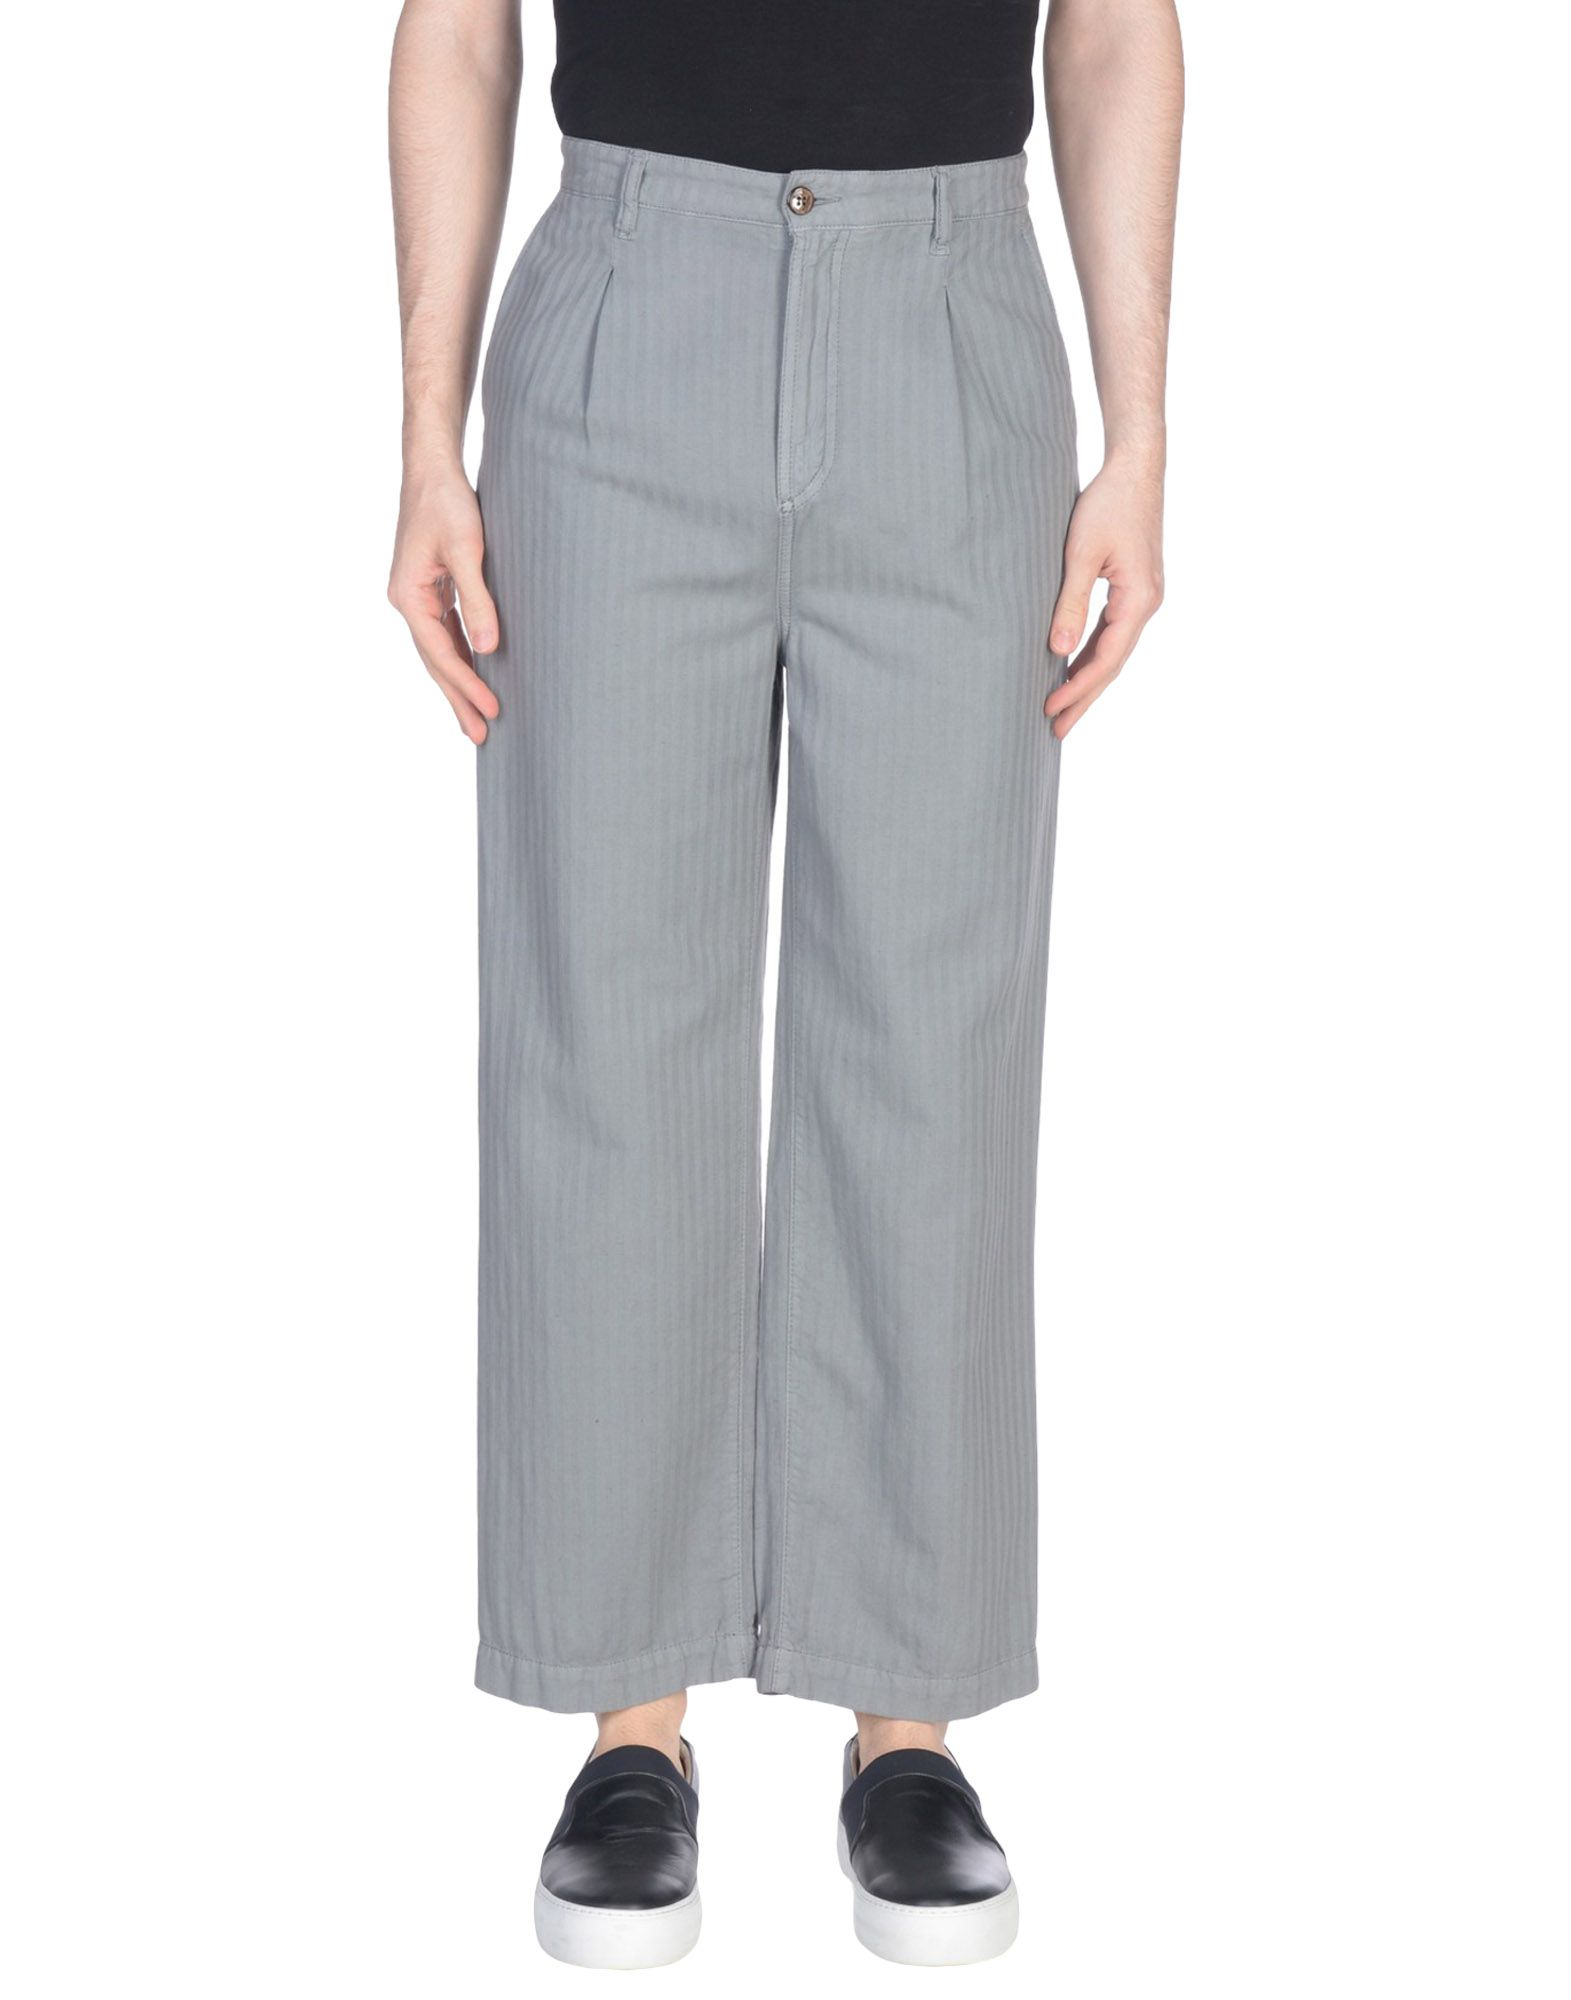 Pantalone True Nyc. Donna - Acquista online su